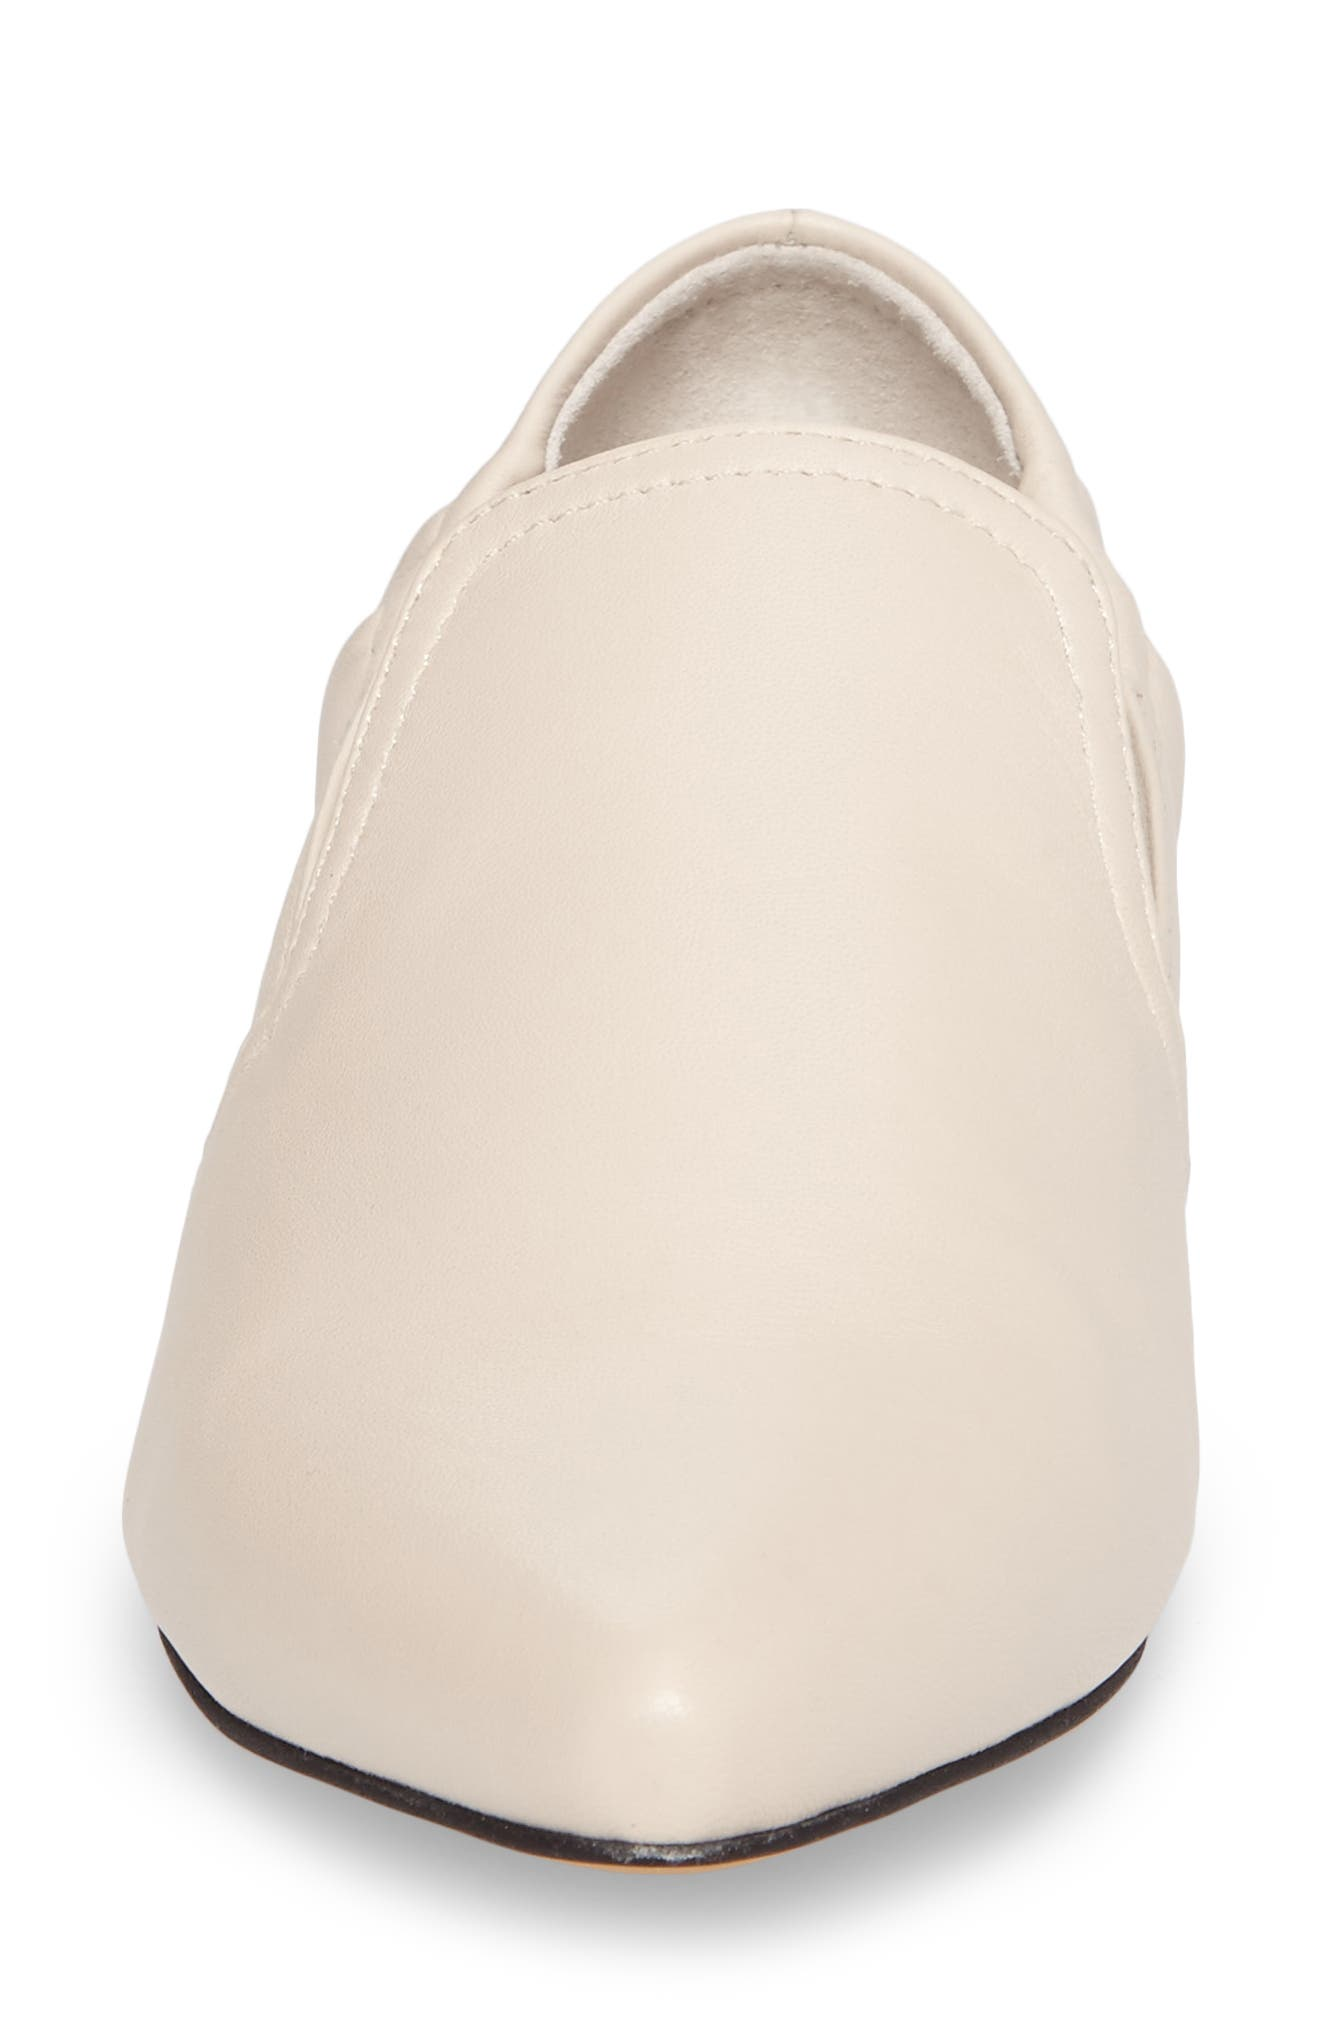 Hamond Loafer,                             Alternate thumbnail 4, color,                             Ivory Leather